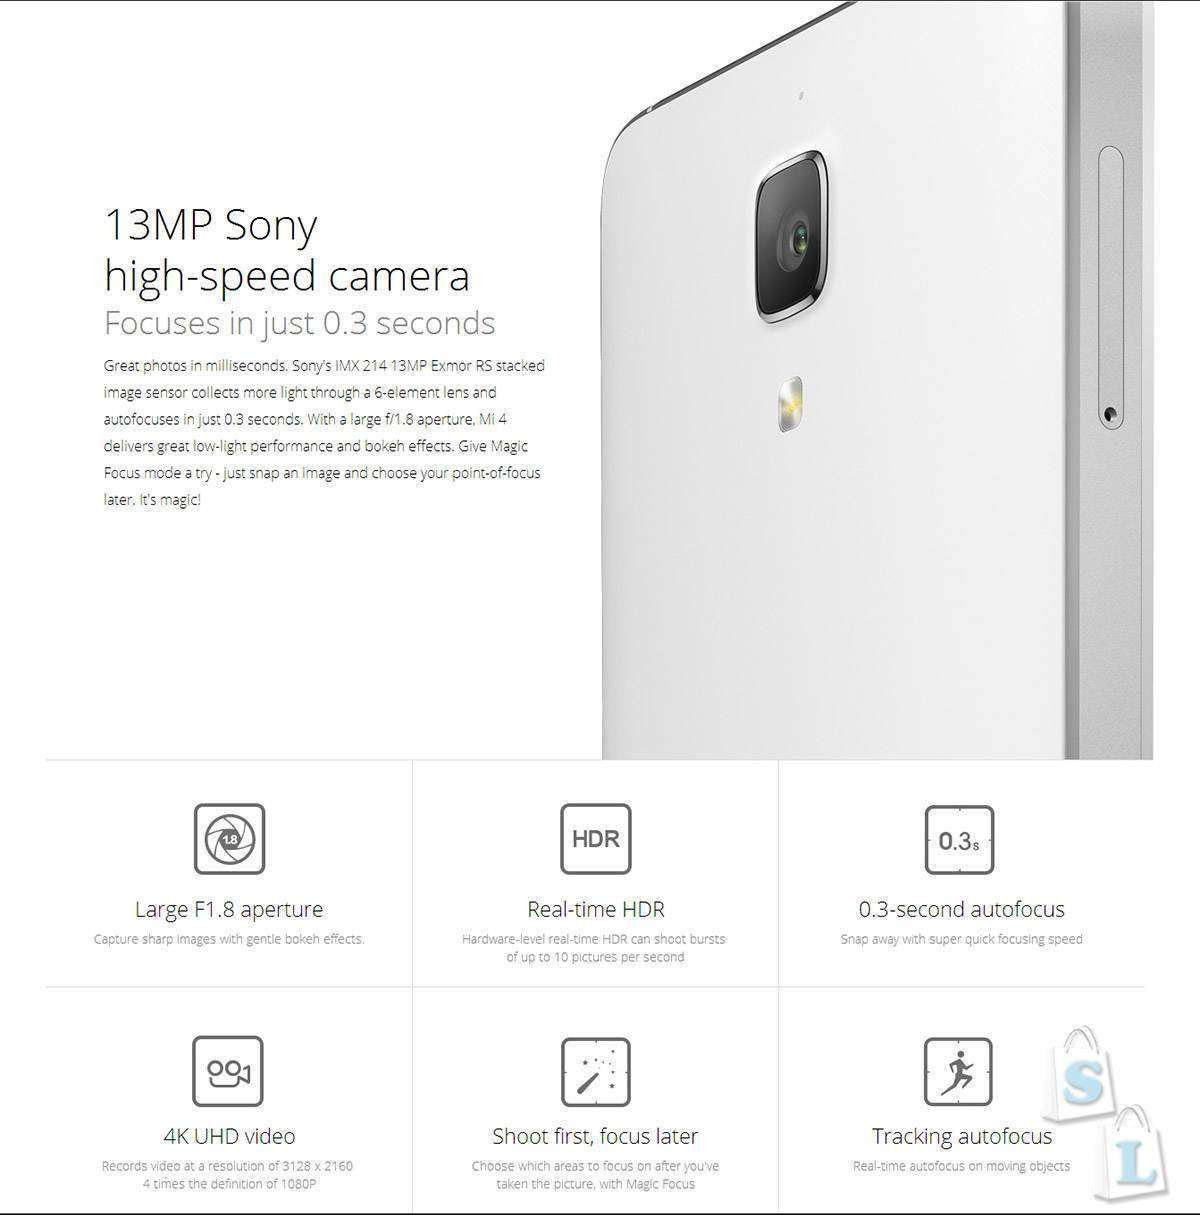 GearBest: Распродажа XIAOMI MI4 по низкой цене 4.99